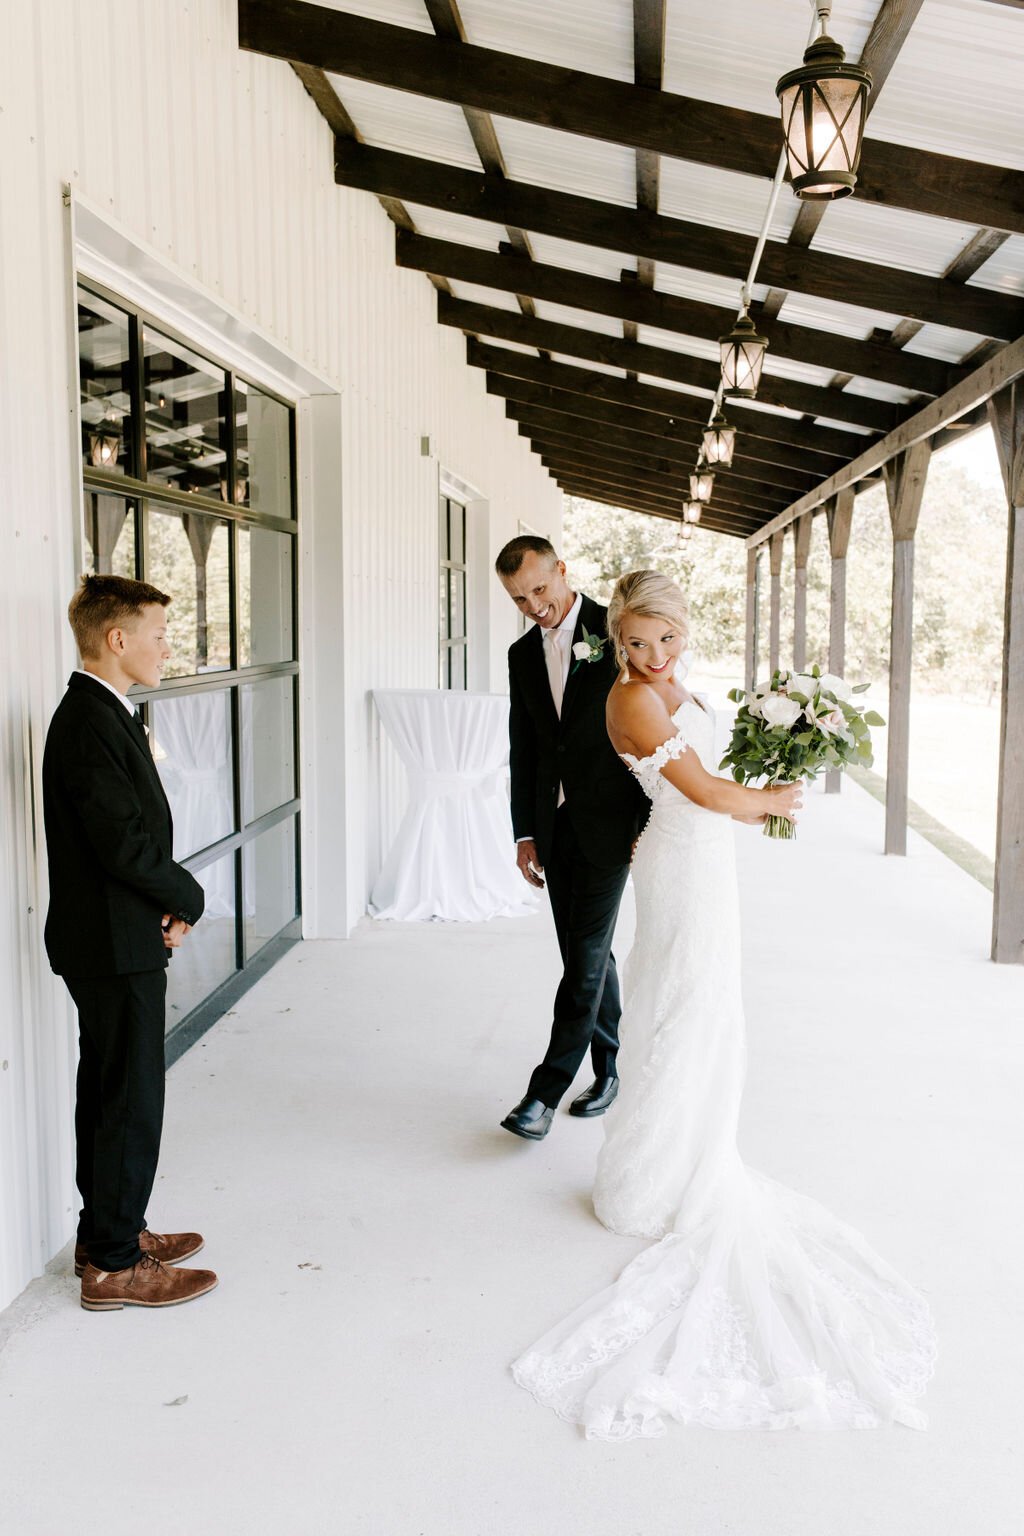 Tulsa White Barn Wedding Venue Outdoor Ceremony 38.jpg